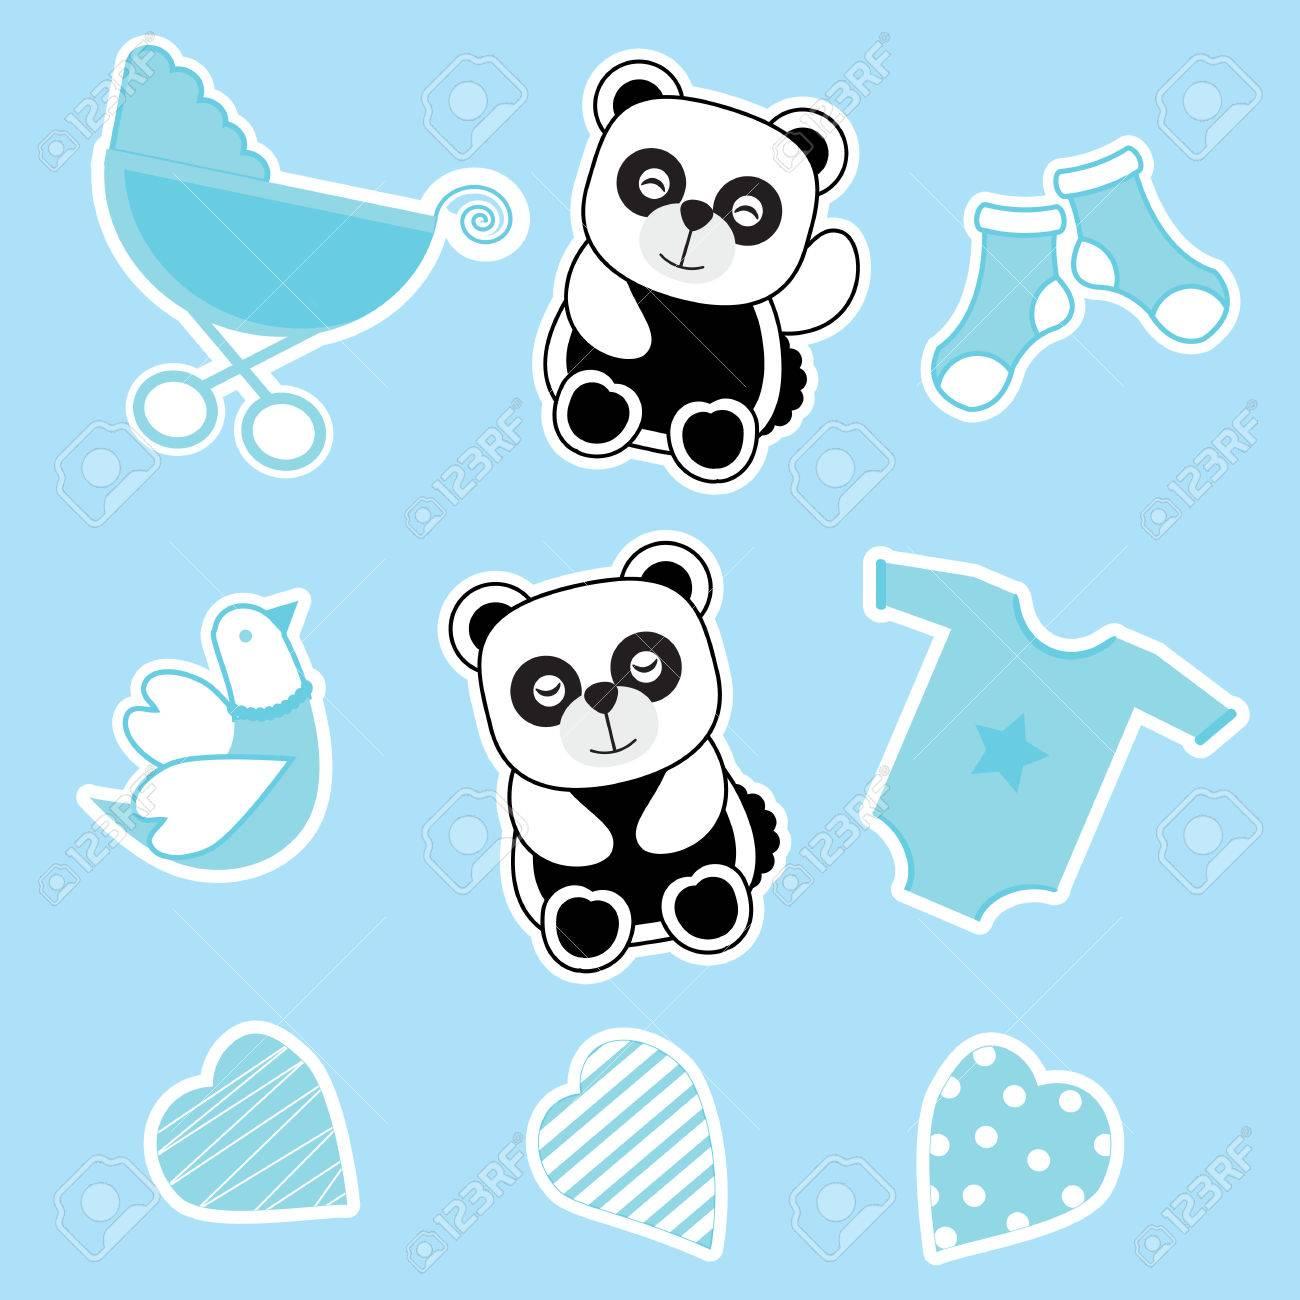 468ecf6b1 Baby Shower Sticker Set With Baby Panda